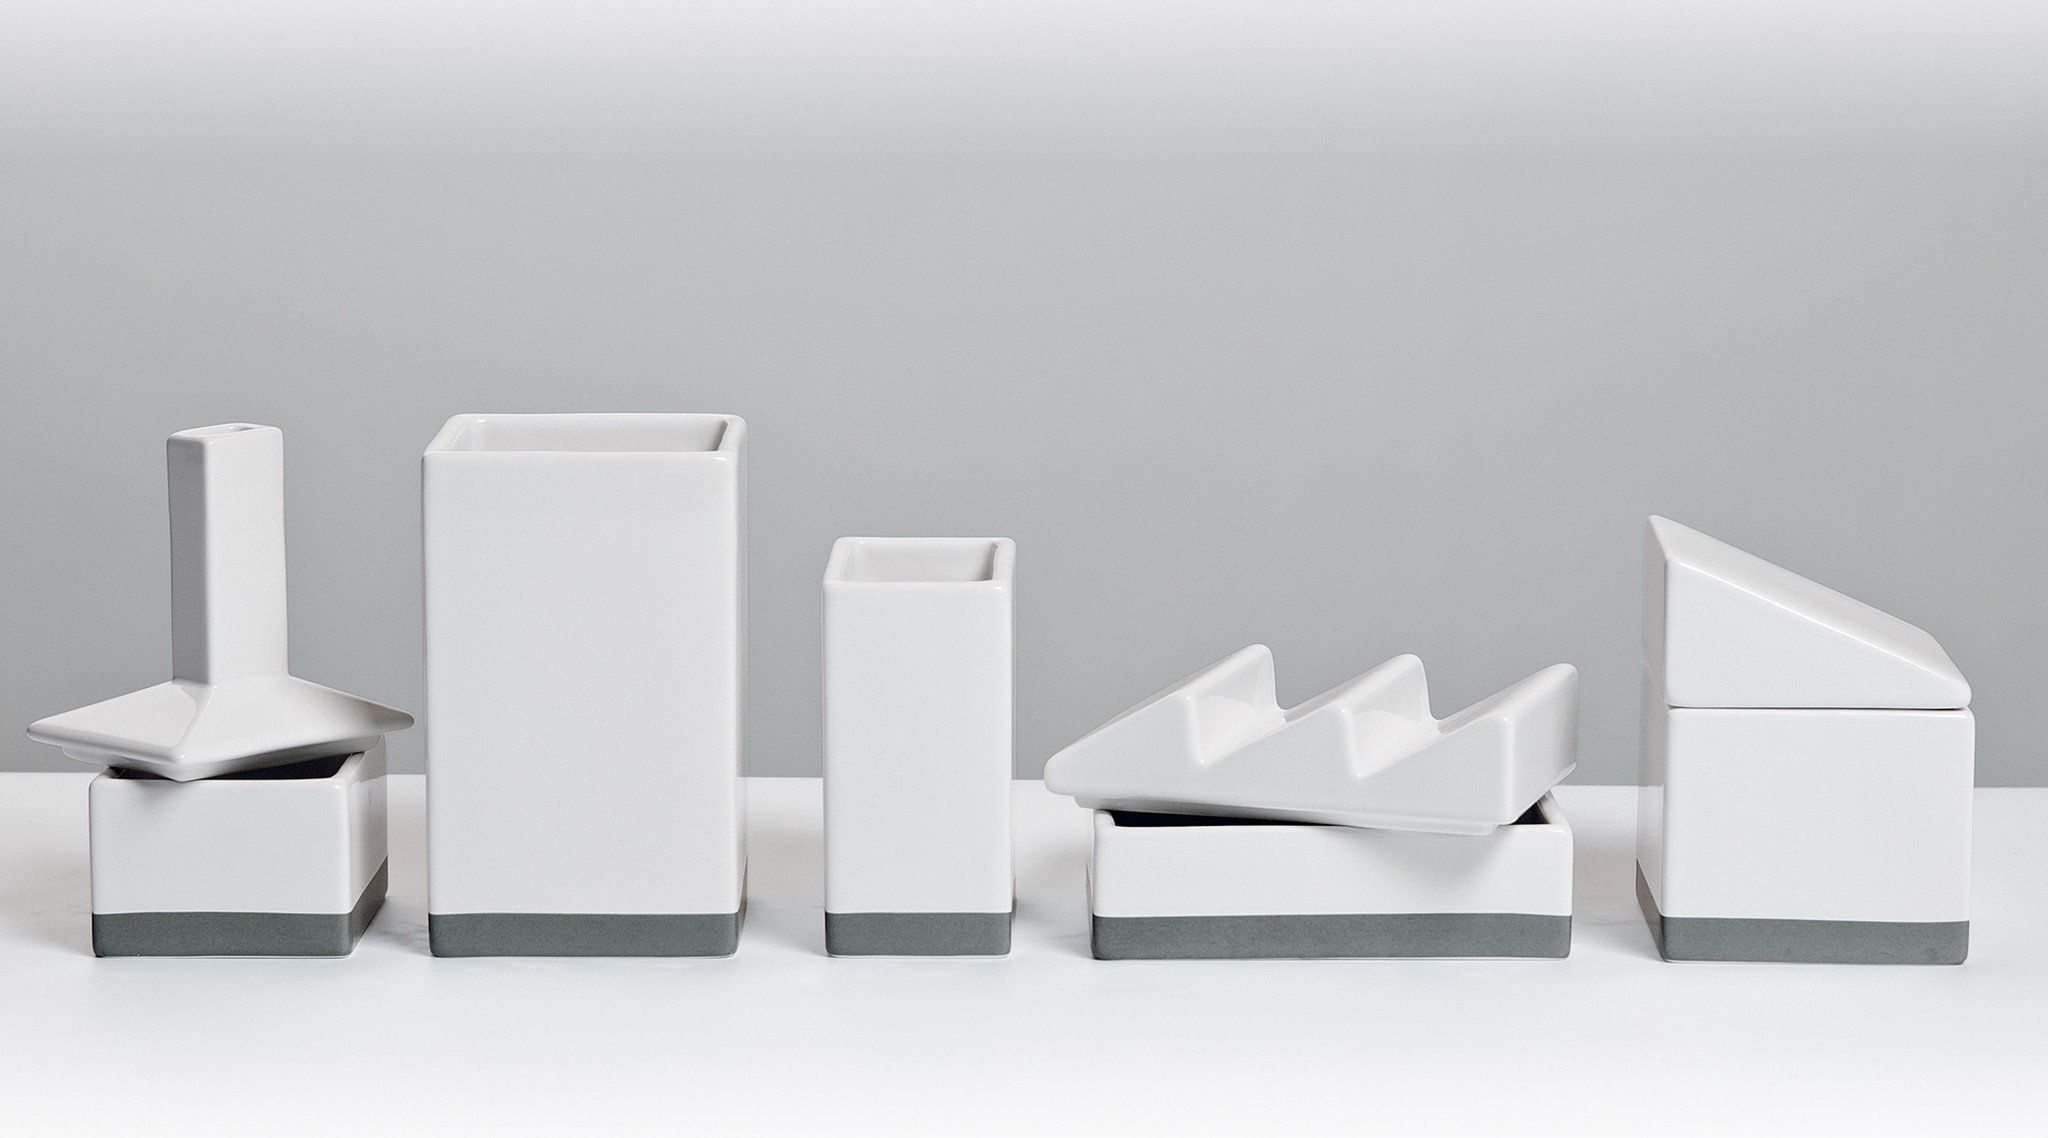 The Warehouse Porcelain Desk Organizer Set Design By Seletti Desk Organizer Set Desk Organization Modern Desk Accessories